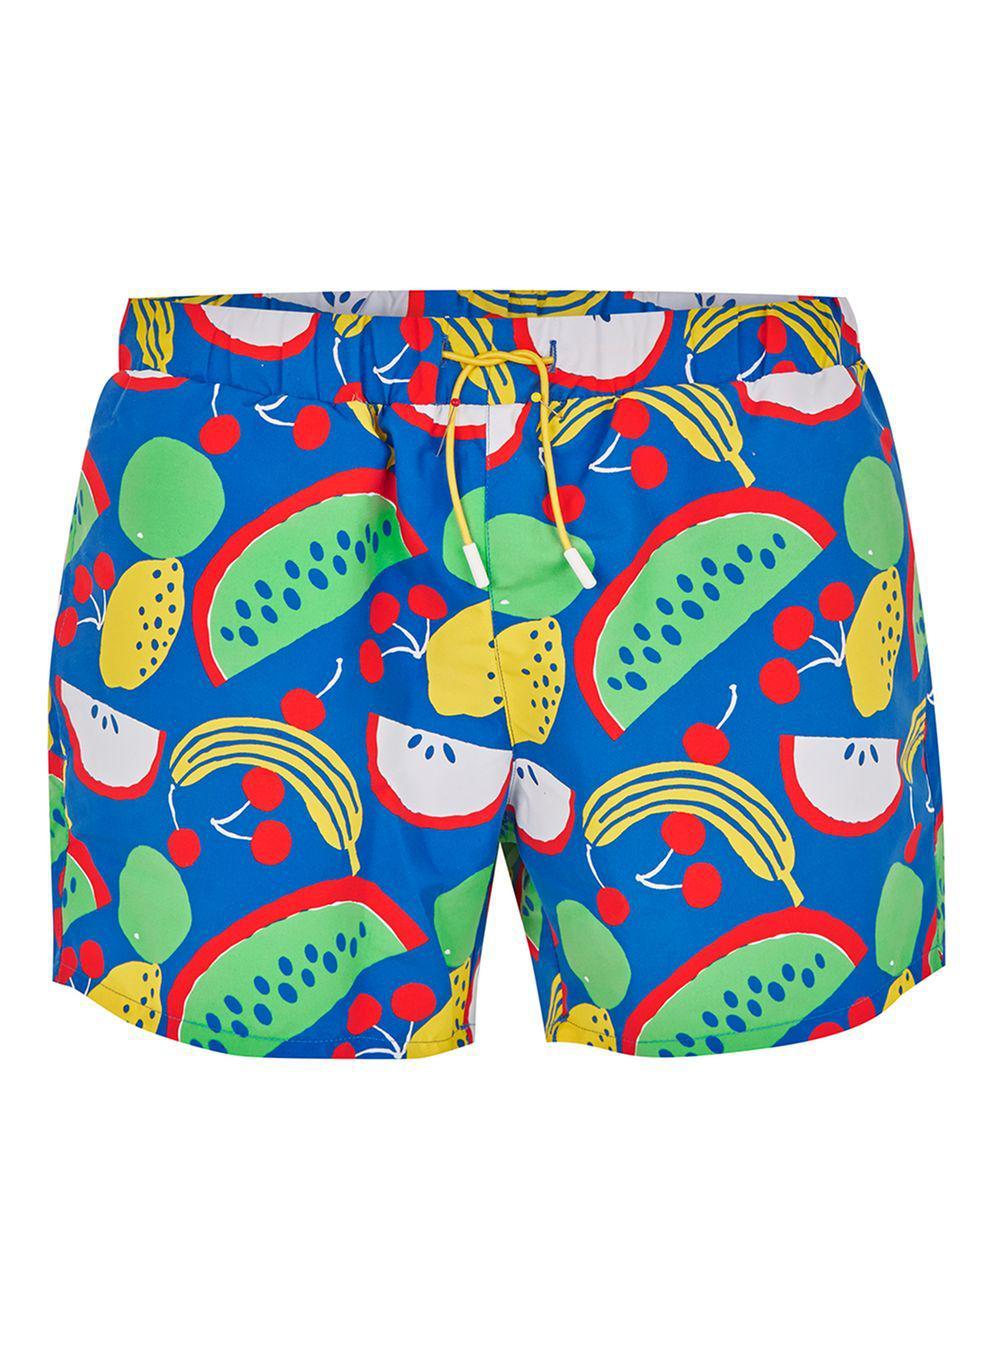 695b767cc5 TOPMAN Blue Fruit Print Swim Shorts in Blue for Men - Lyst